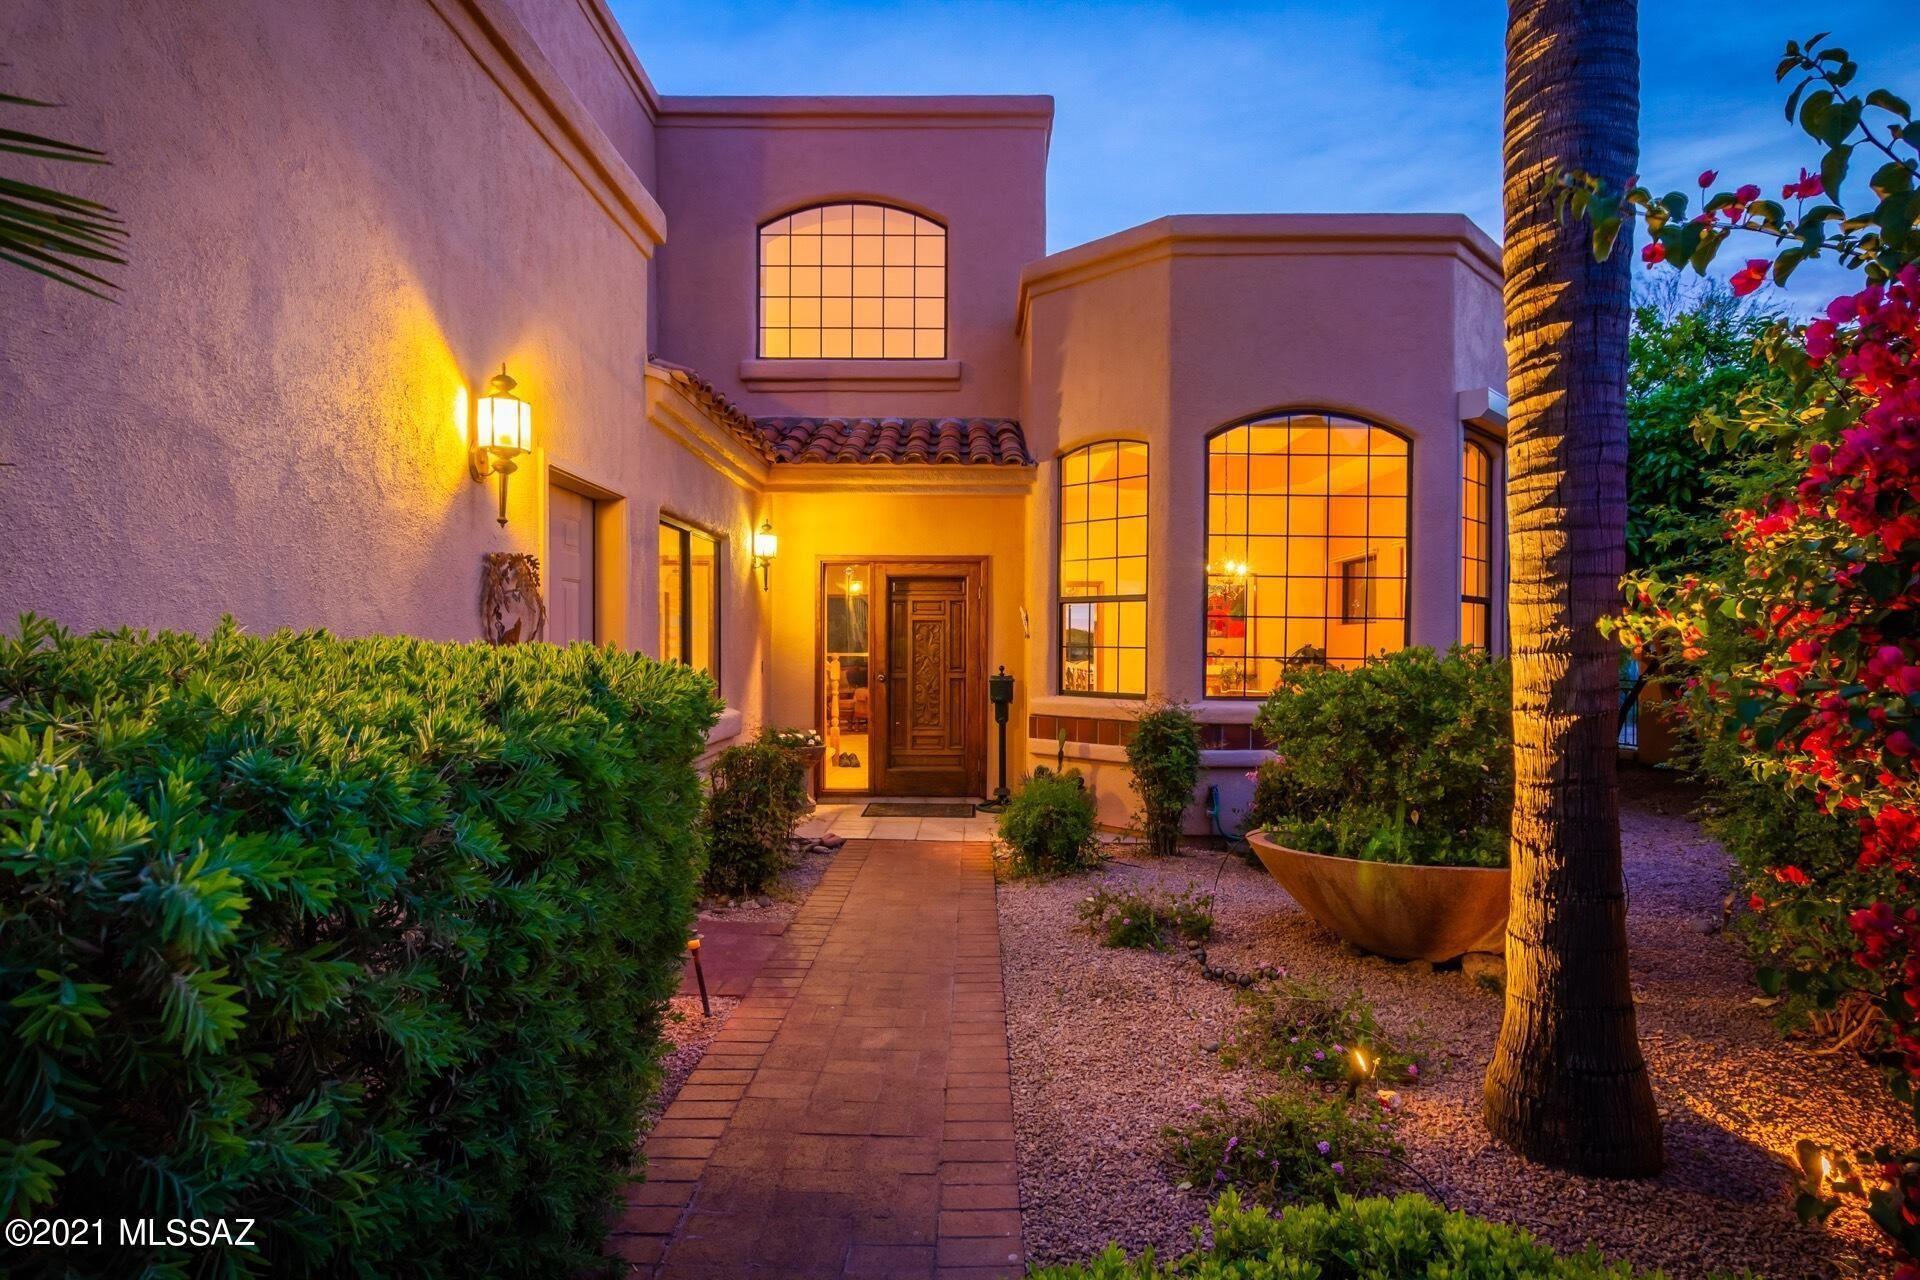 6071 N Via Del Tecaco, Tucson, AZ 85718 - MLS#: 22108759